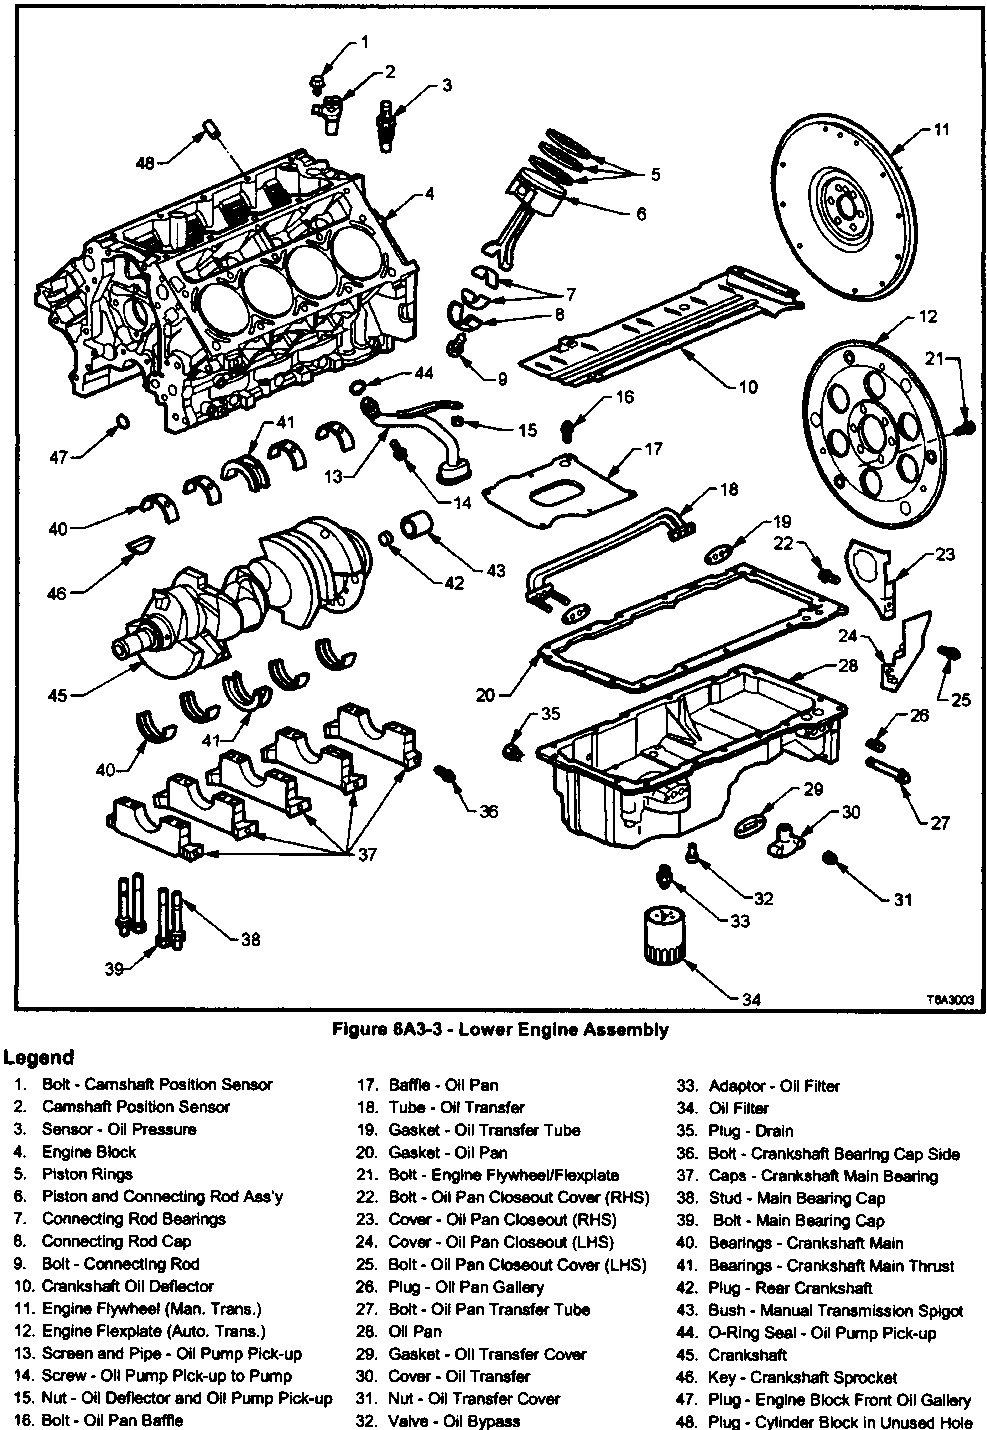 Ls1 Engine Diagram - Complete Wiring Diagram Mustang -  power-poles.tukune.jeanjaures37.fr | 99 Ls1 Engine Block Diagram |  | Wiring Diagram Resource